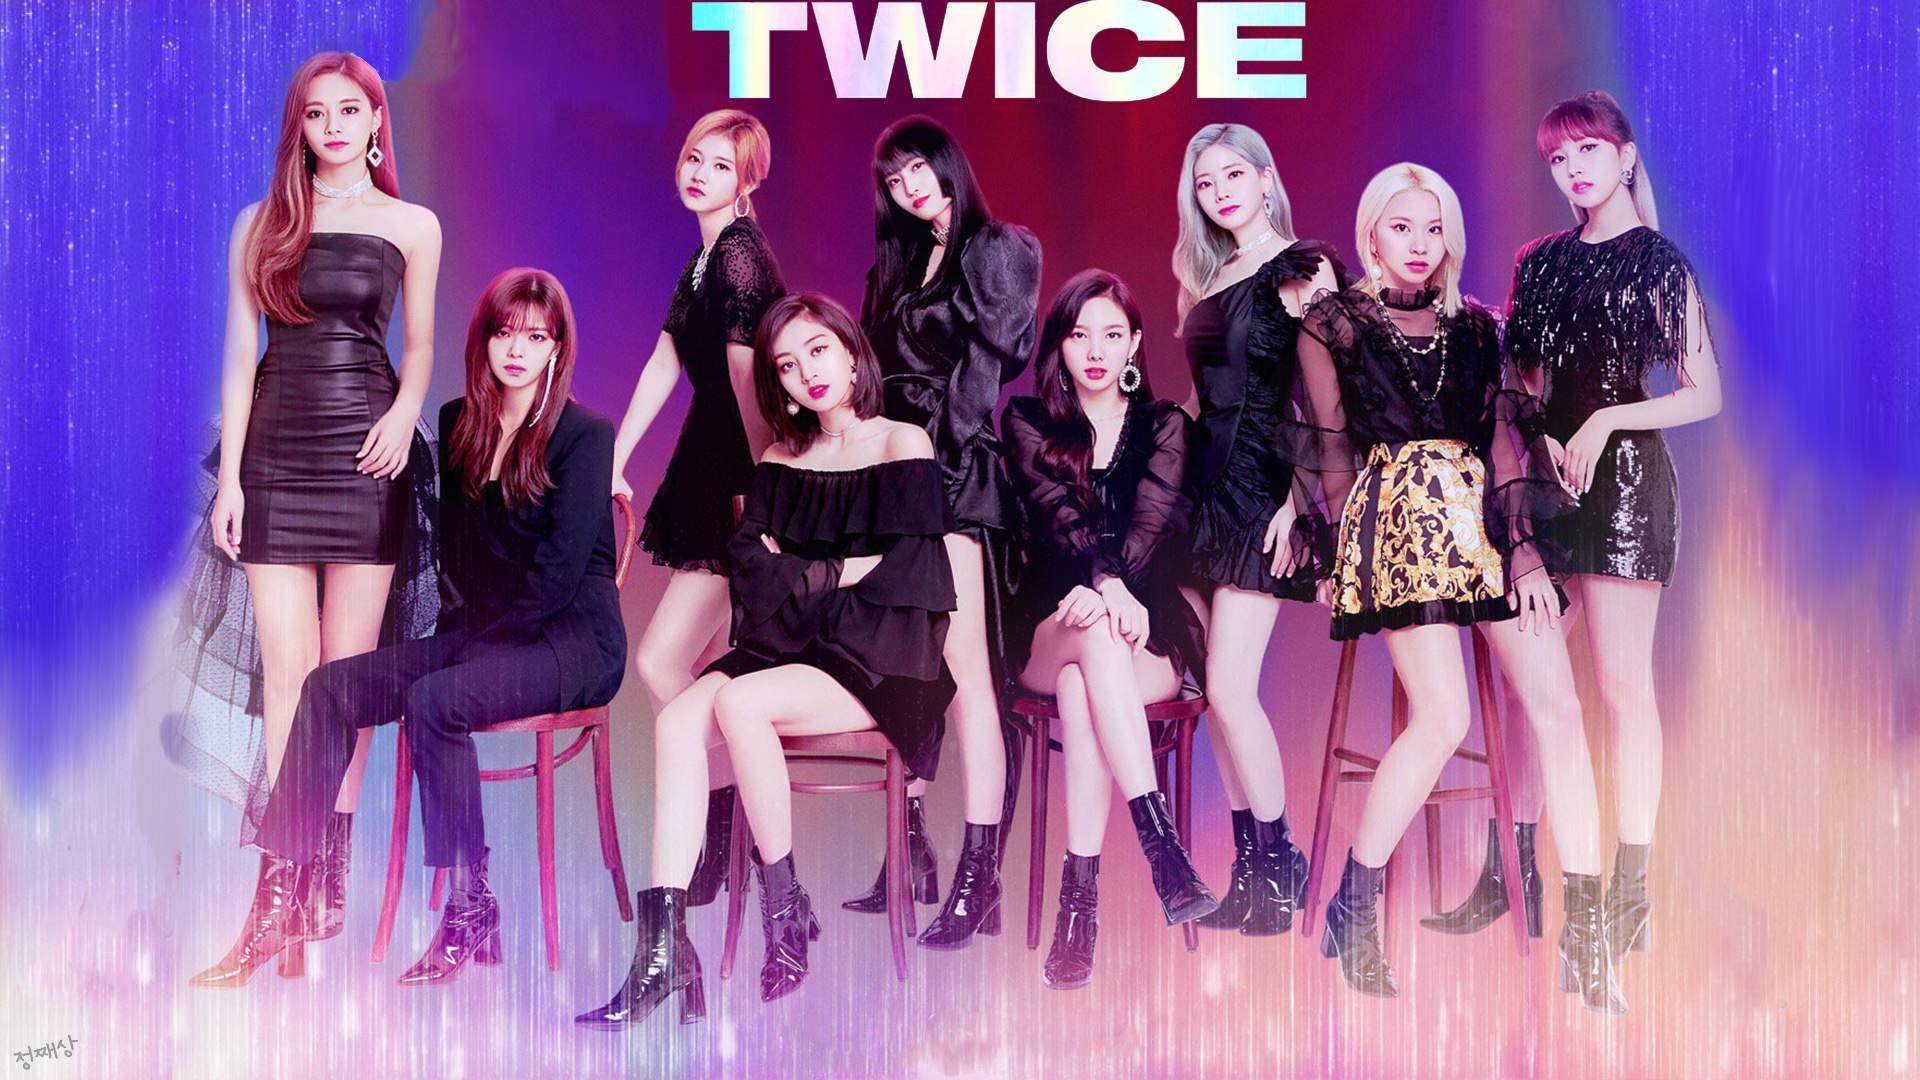 Wallpaper Twice World Tour 2019 Twicelights Twice 트와이스 ㅤ